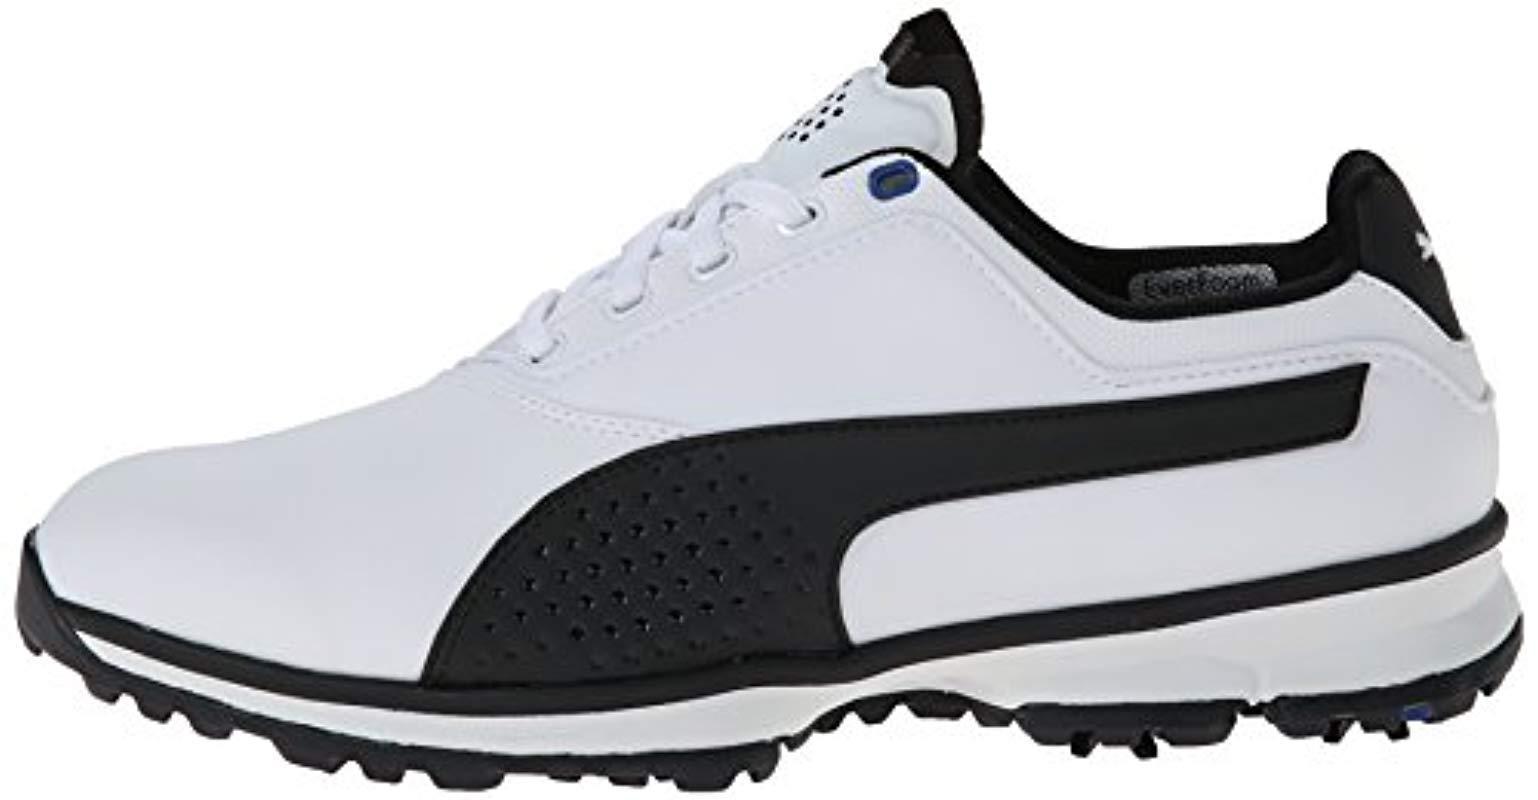 PUMA Titanlite Golf Shoe in White/Black